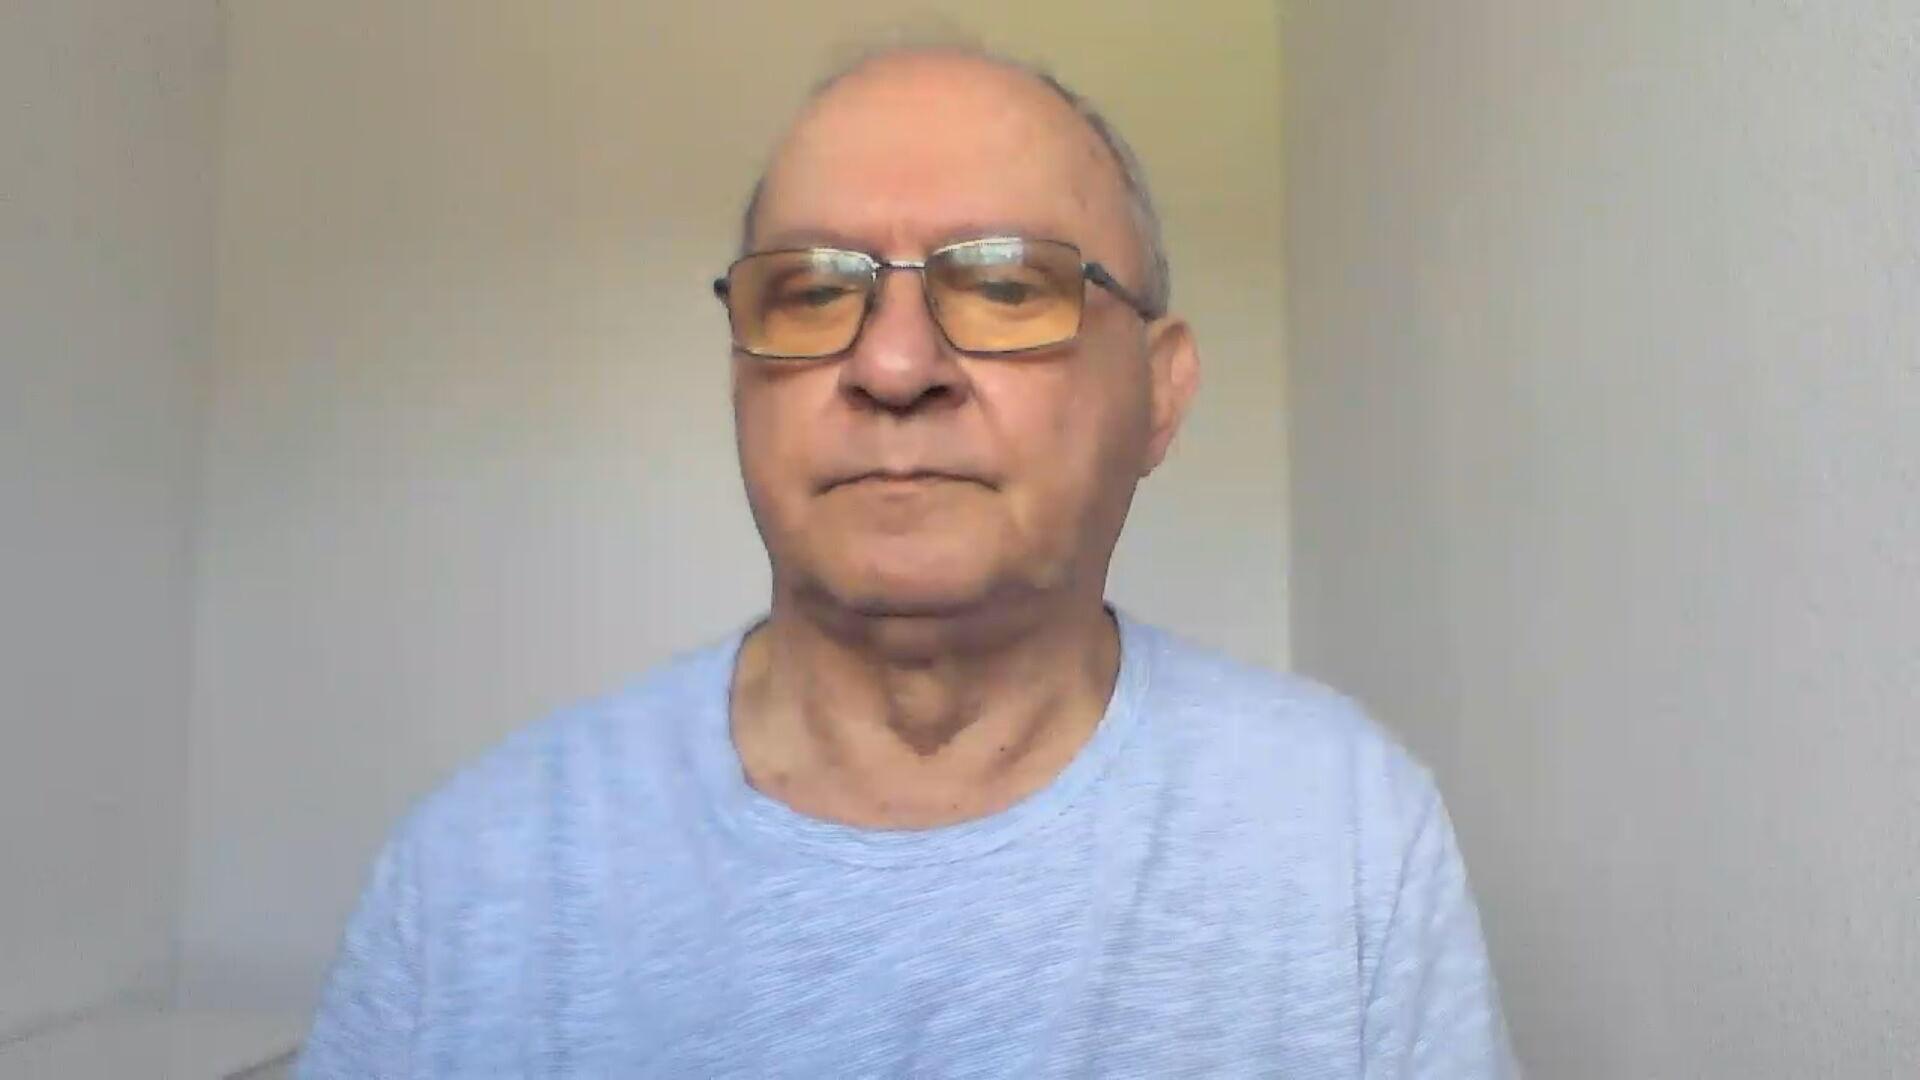 José Geraldo Mill, médico, coordenador de pesquisa no Hospital da UFES